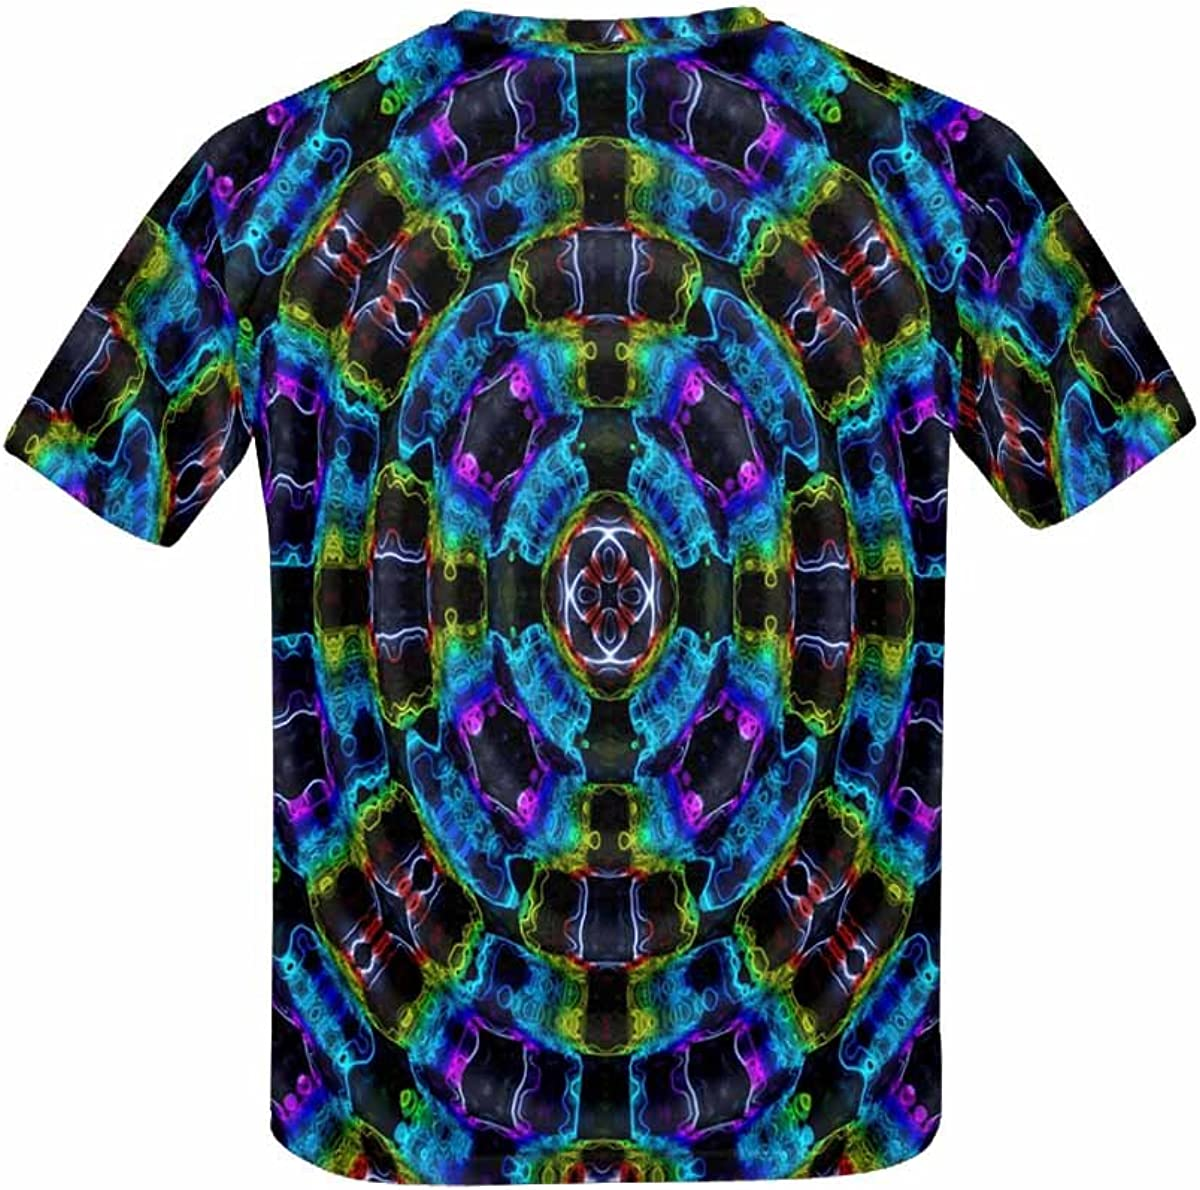 XS-XL INTERESTPRINT Kids T-Shirt Colorful Graphics Pattern Quadrangle